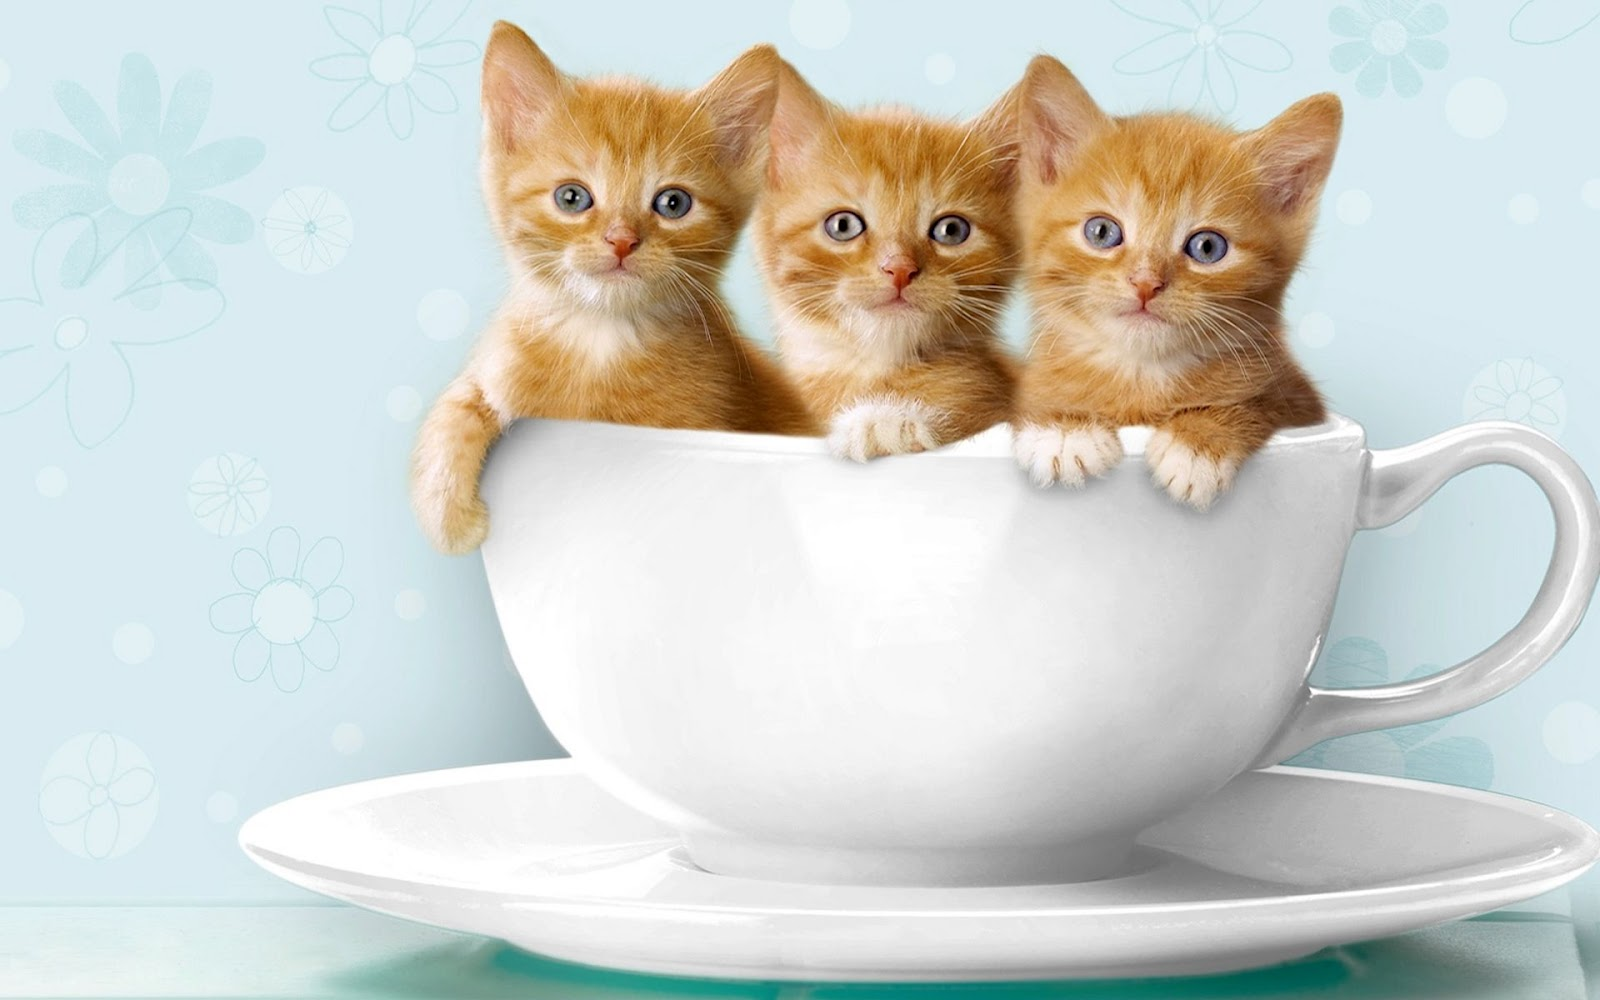 Baby Cat Cute Kittens in Cups